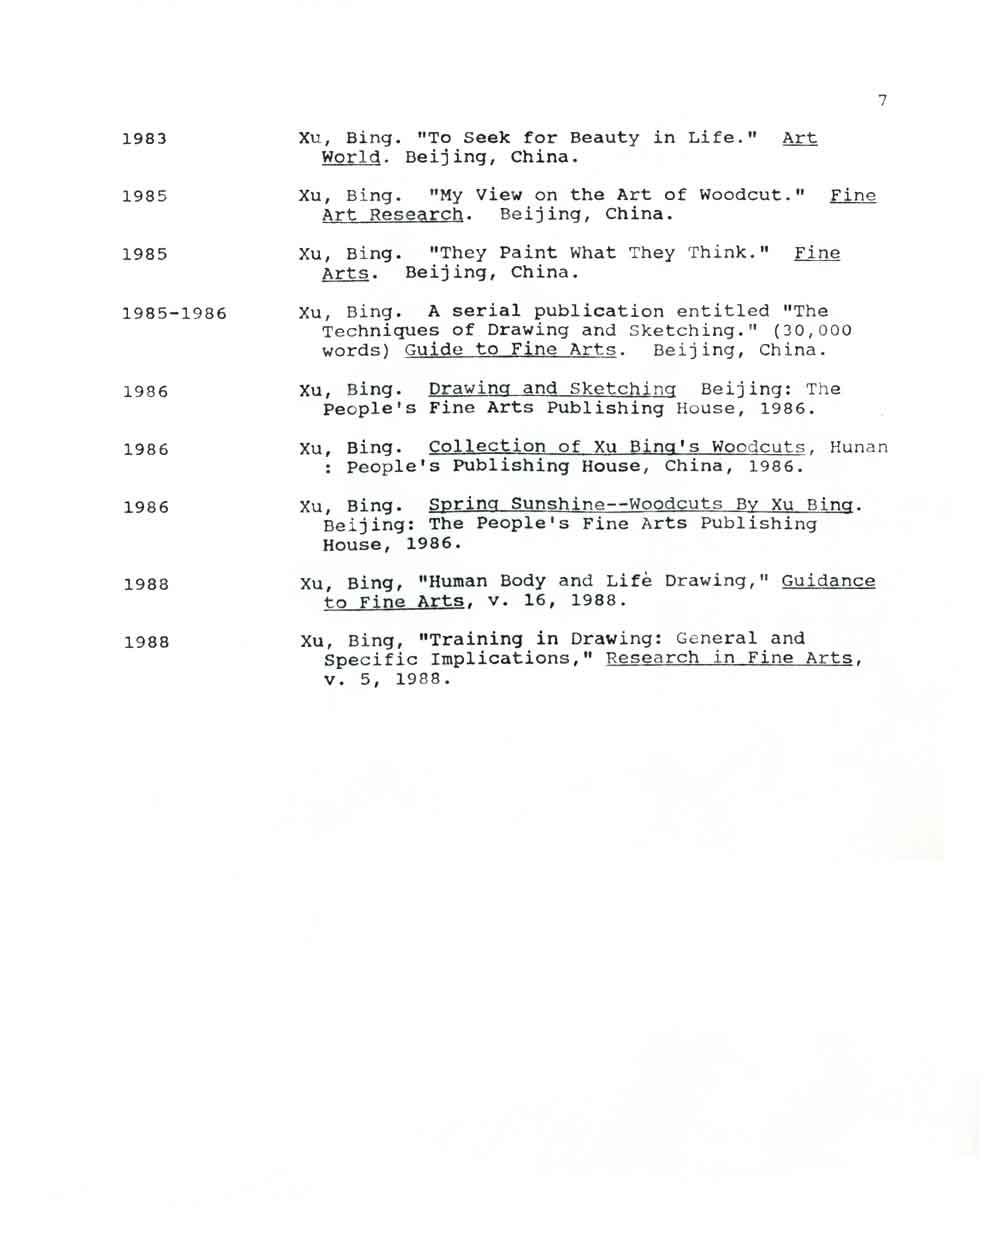 Bing Xu's Resume, pg 7